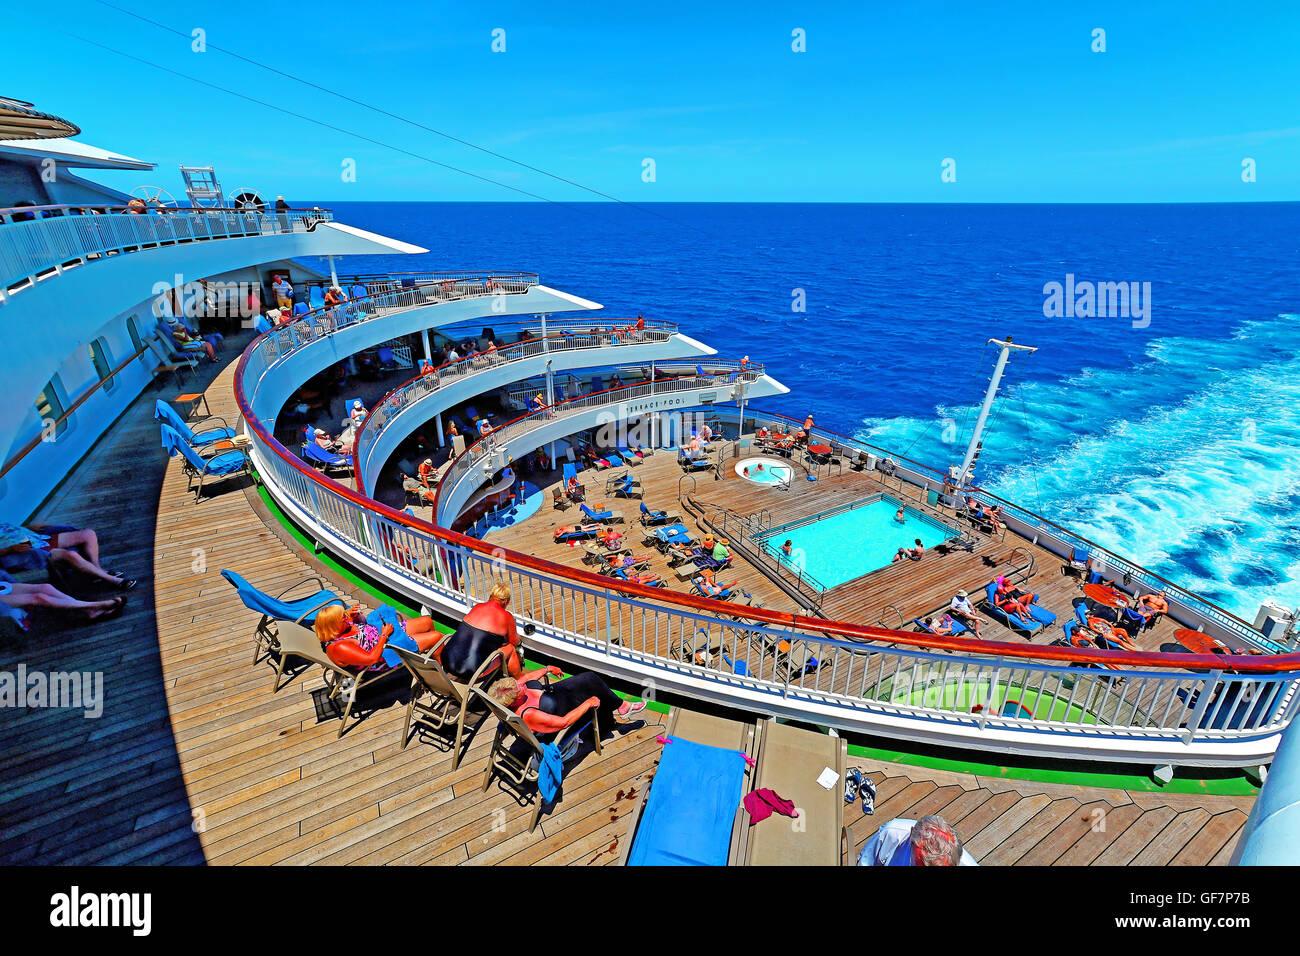 P&O cruise ship Aurora aft terrace pool in the Mediterranean sea Stock Photo